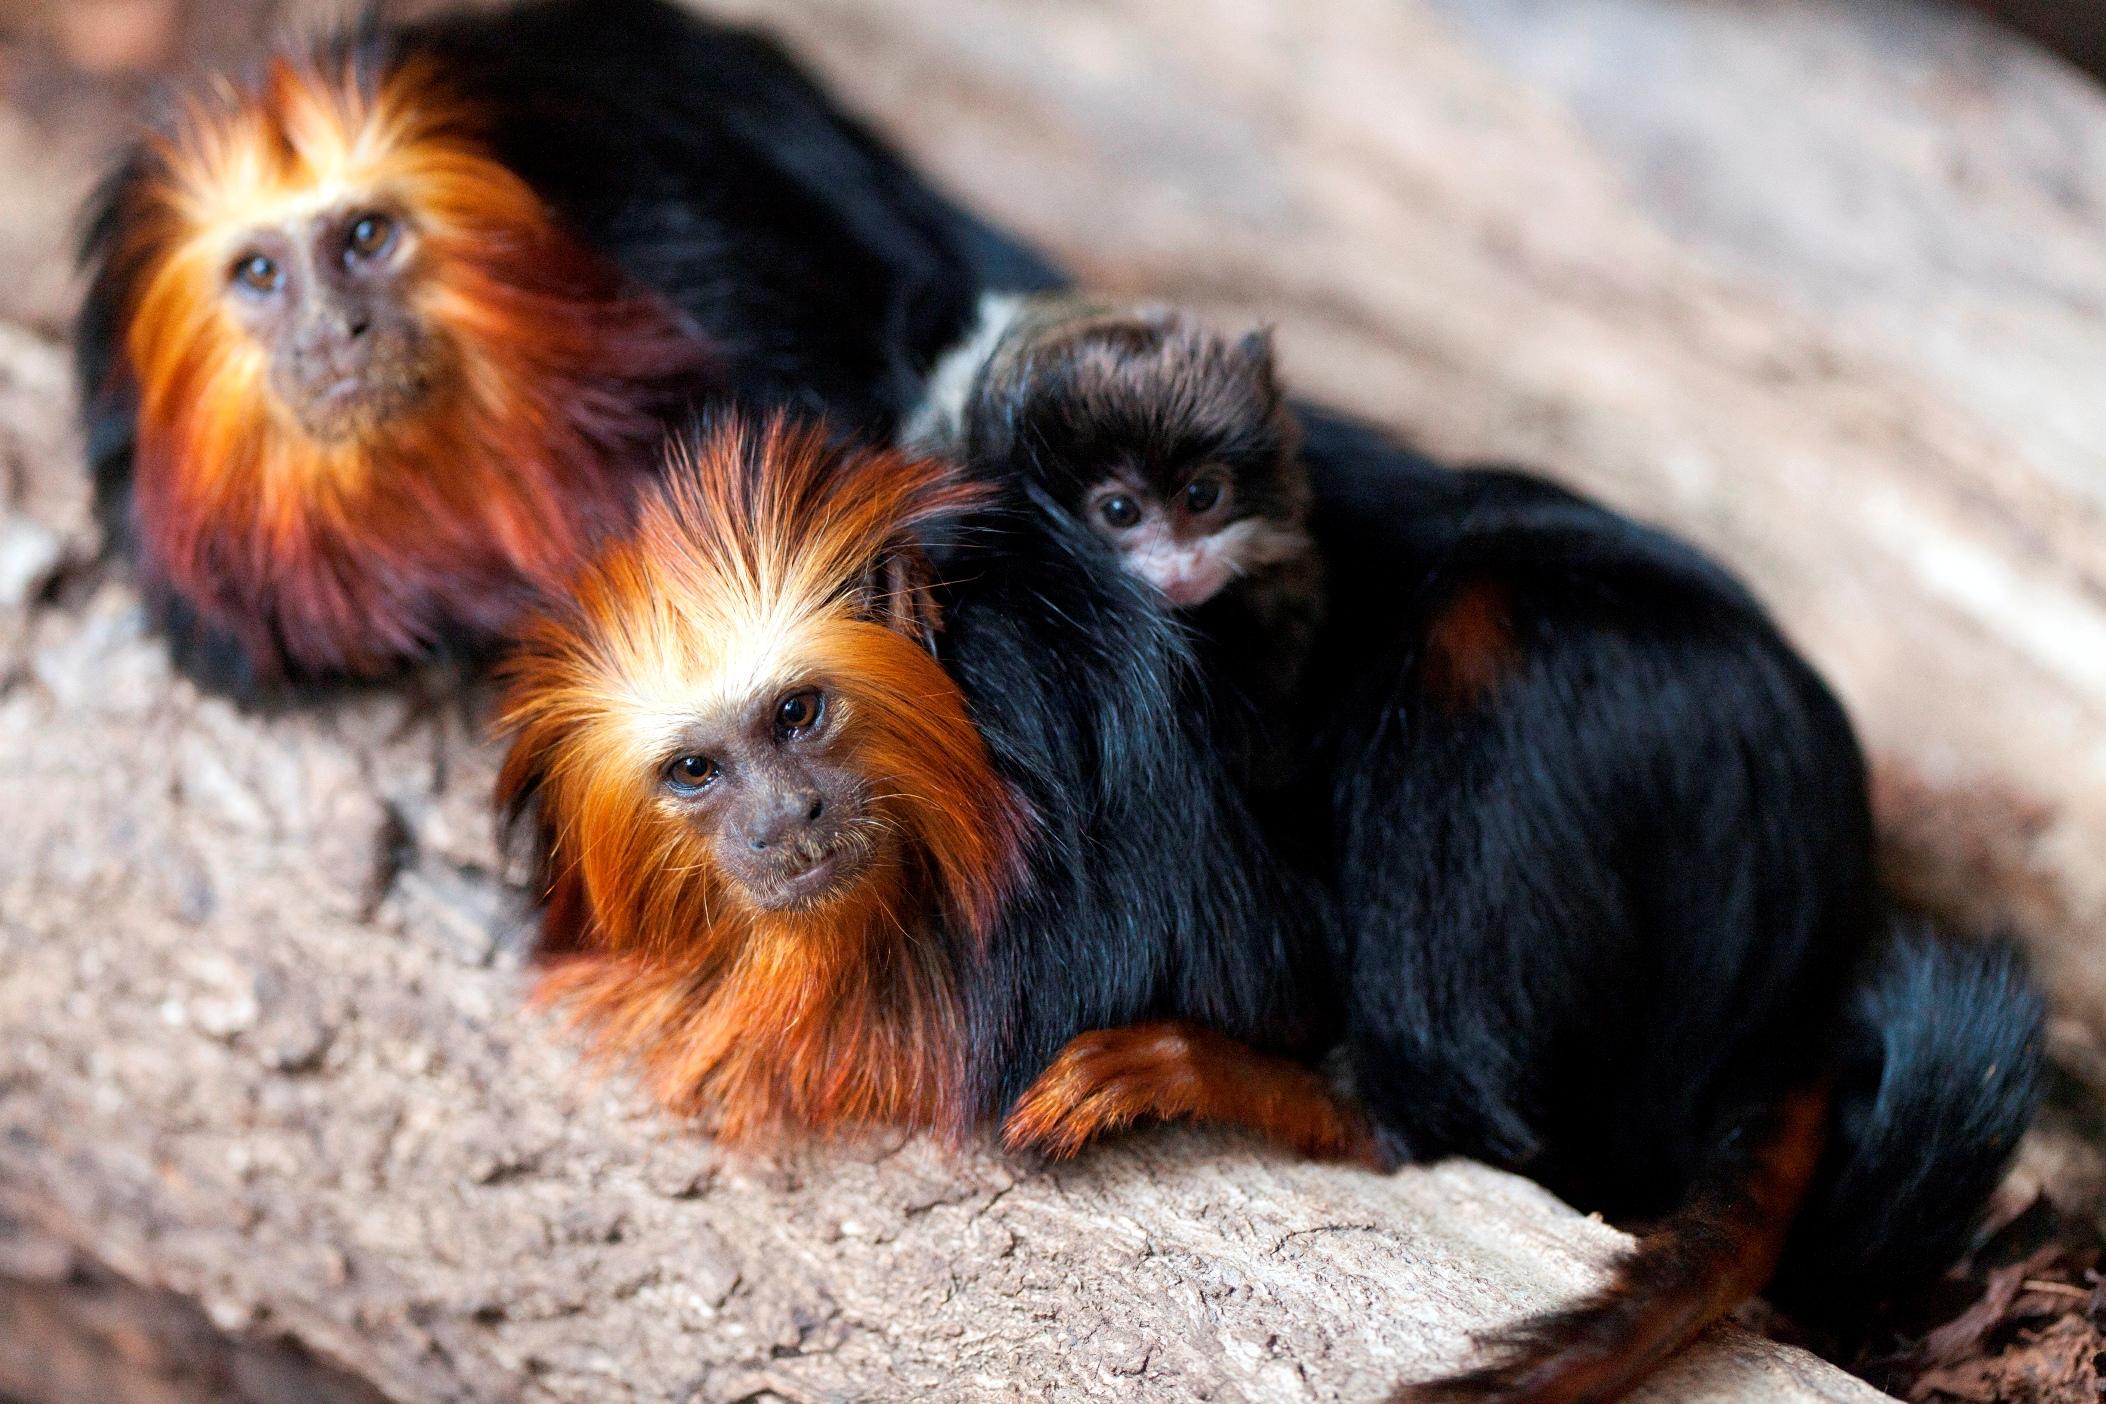 Baby emperor tamarin monkey